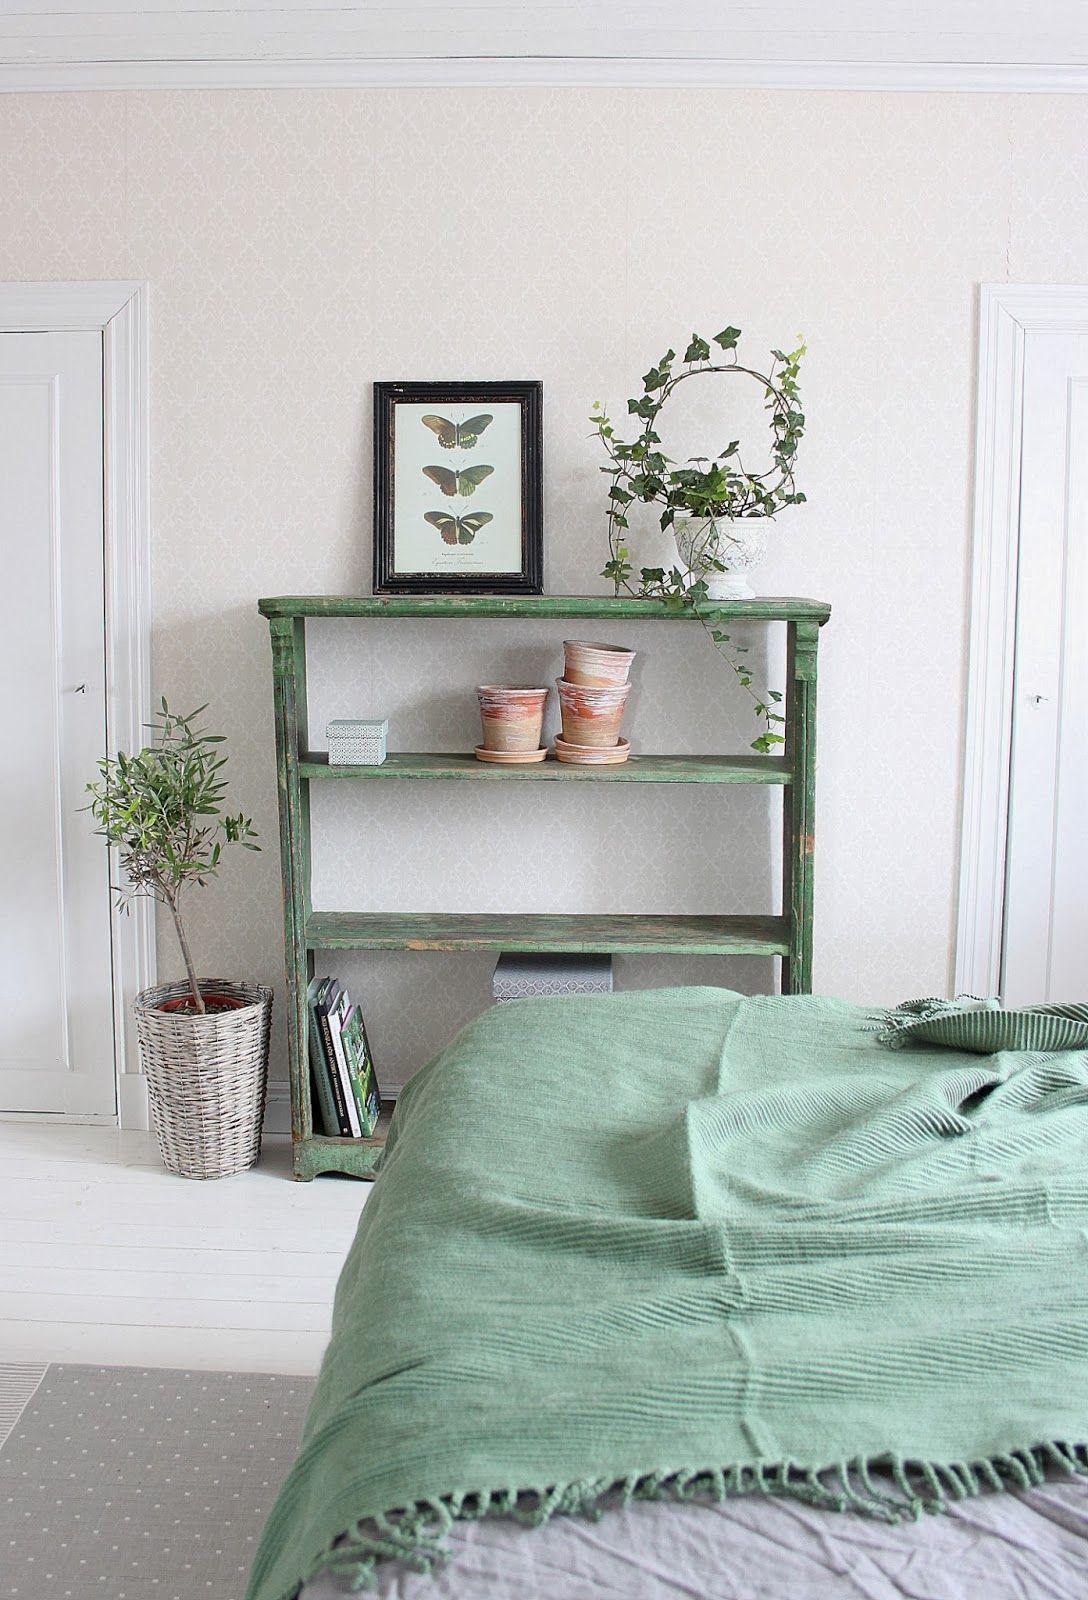 Vicky's Home: Casa noruega llena de encanto / Norwegian house full of charm